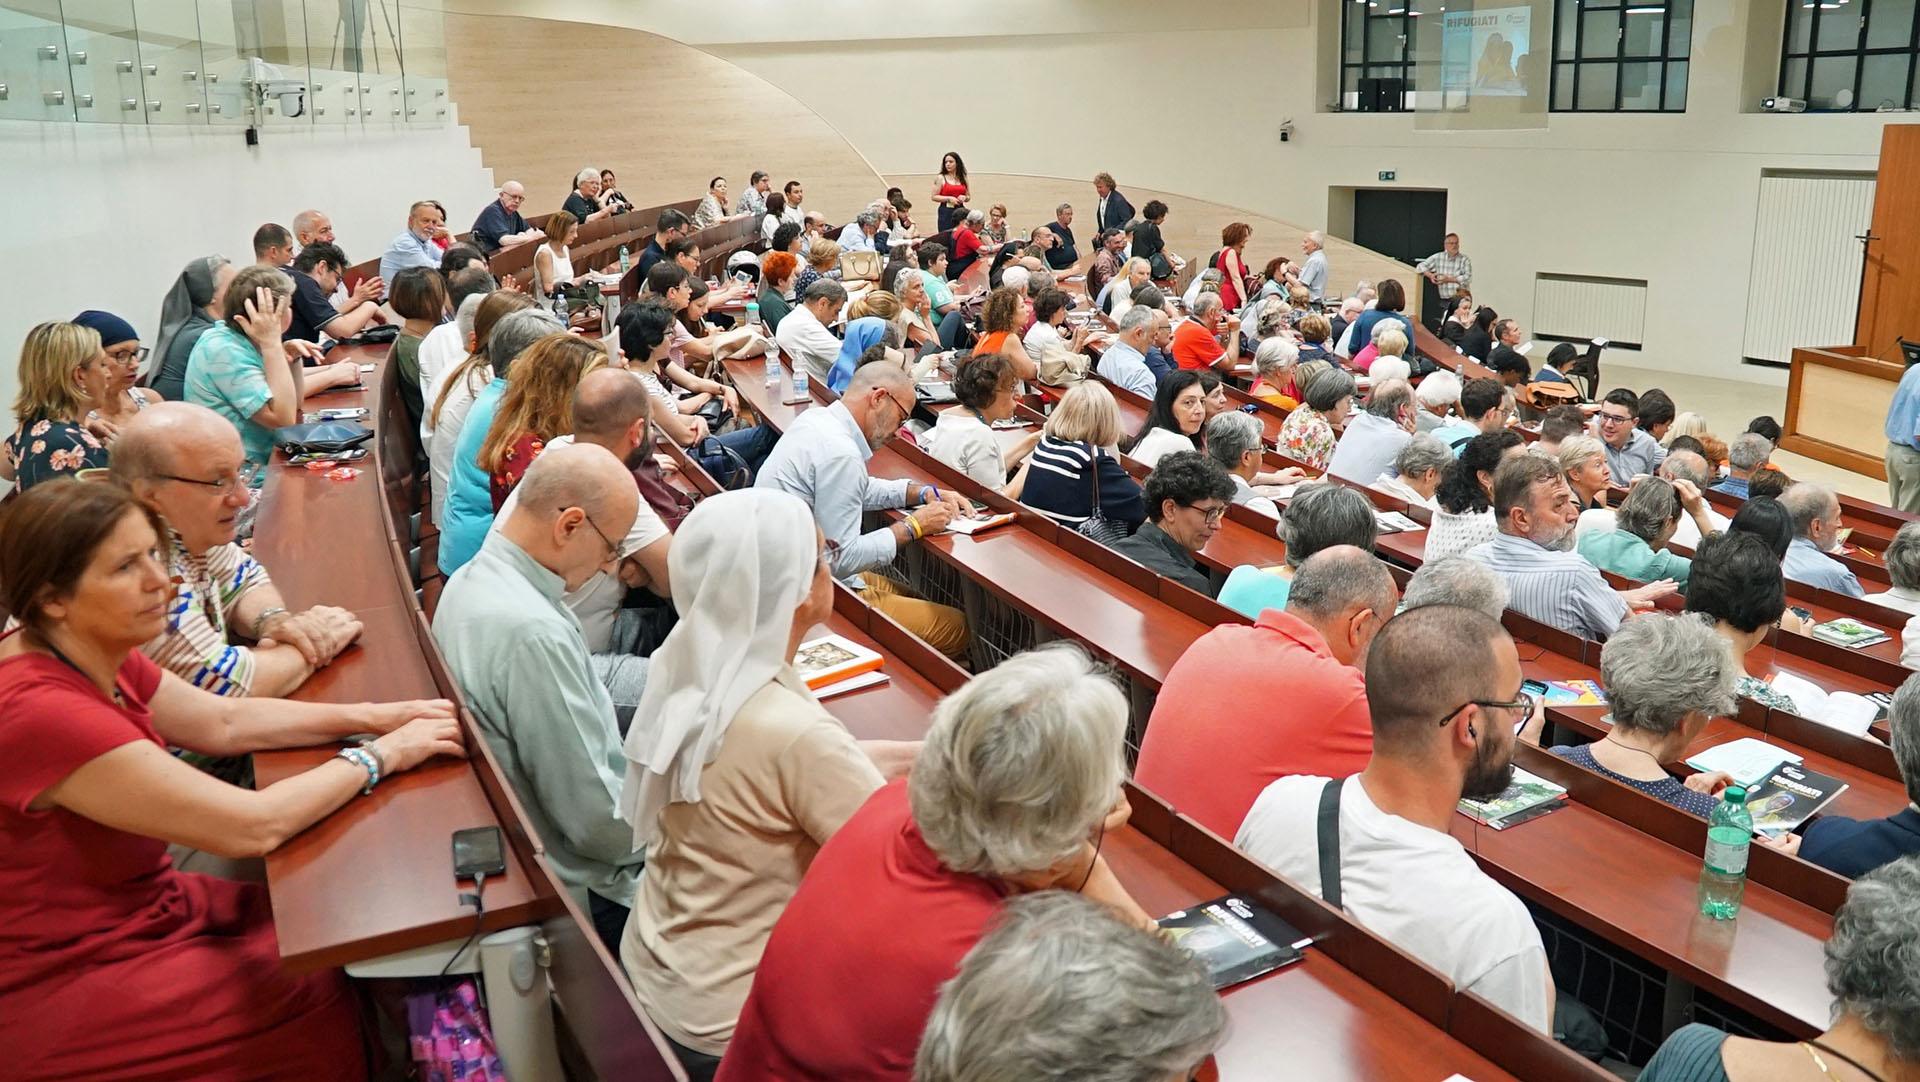 Centro Astalli marks World Refugee Day